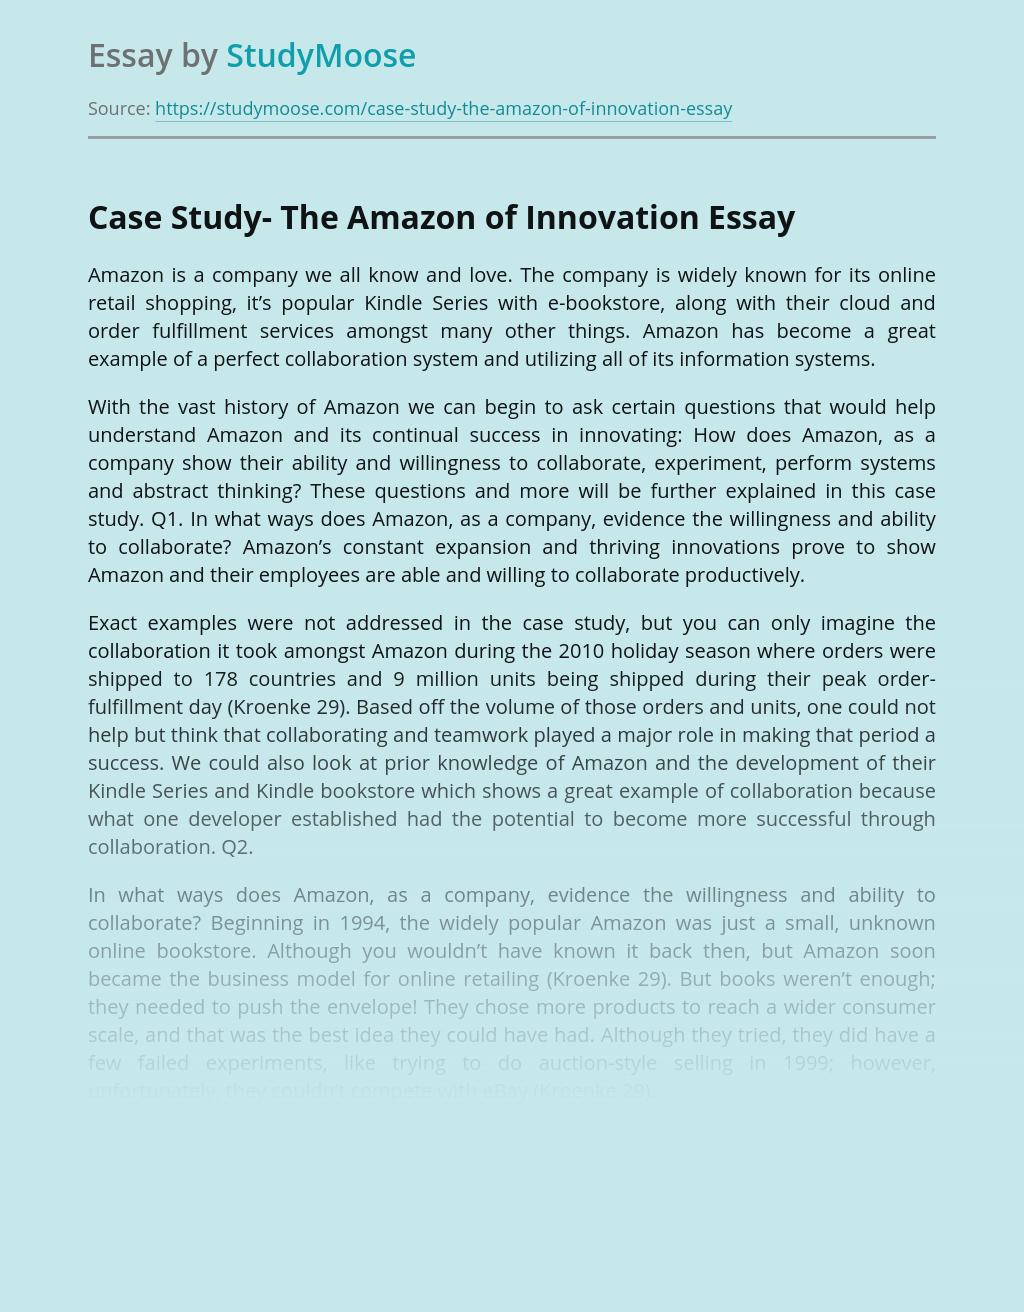 Case Study- The Amazon of Innovation